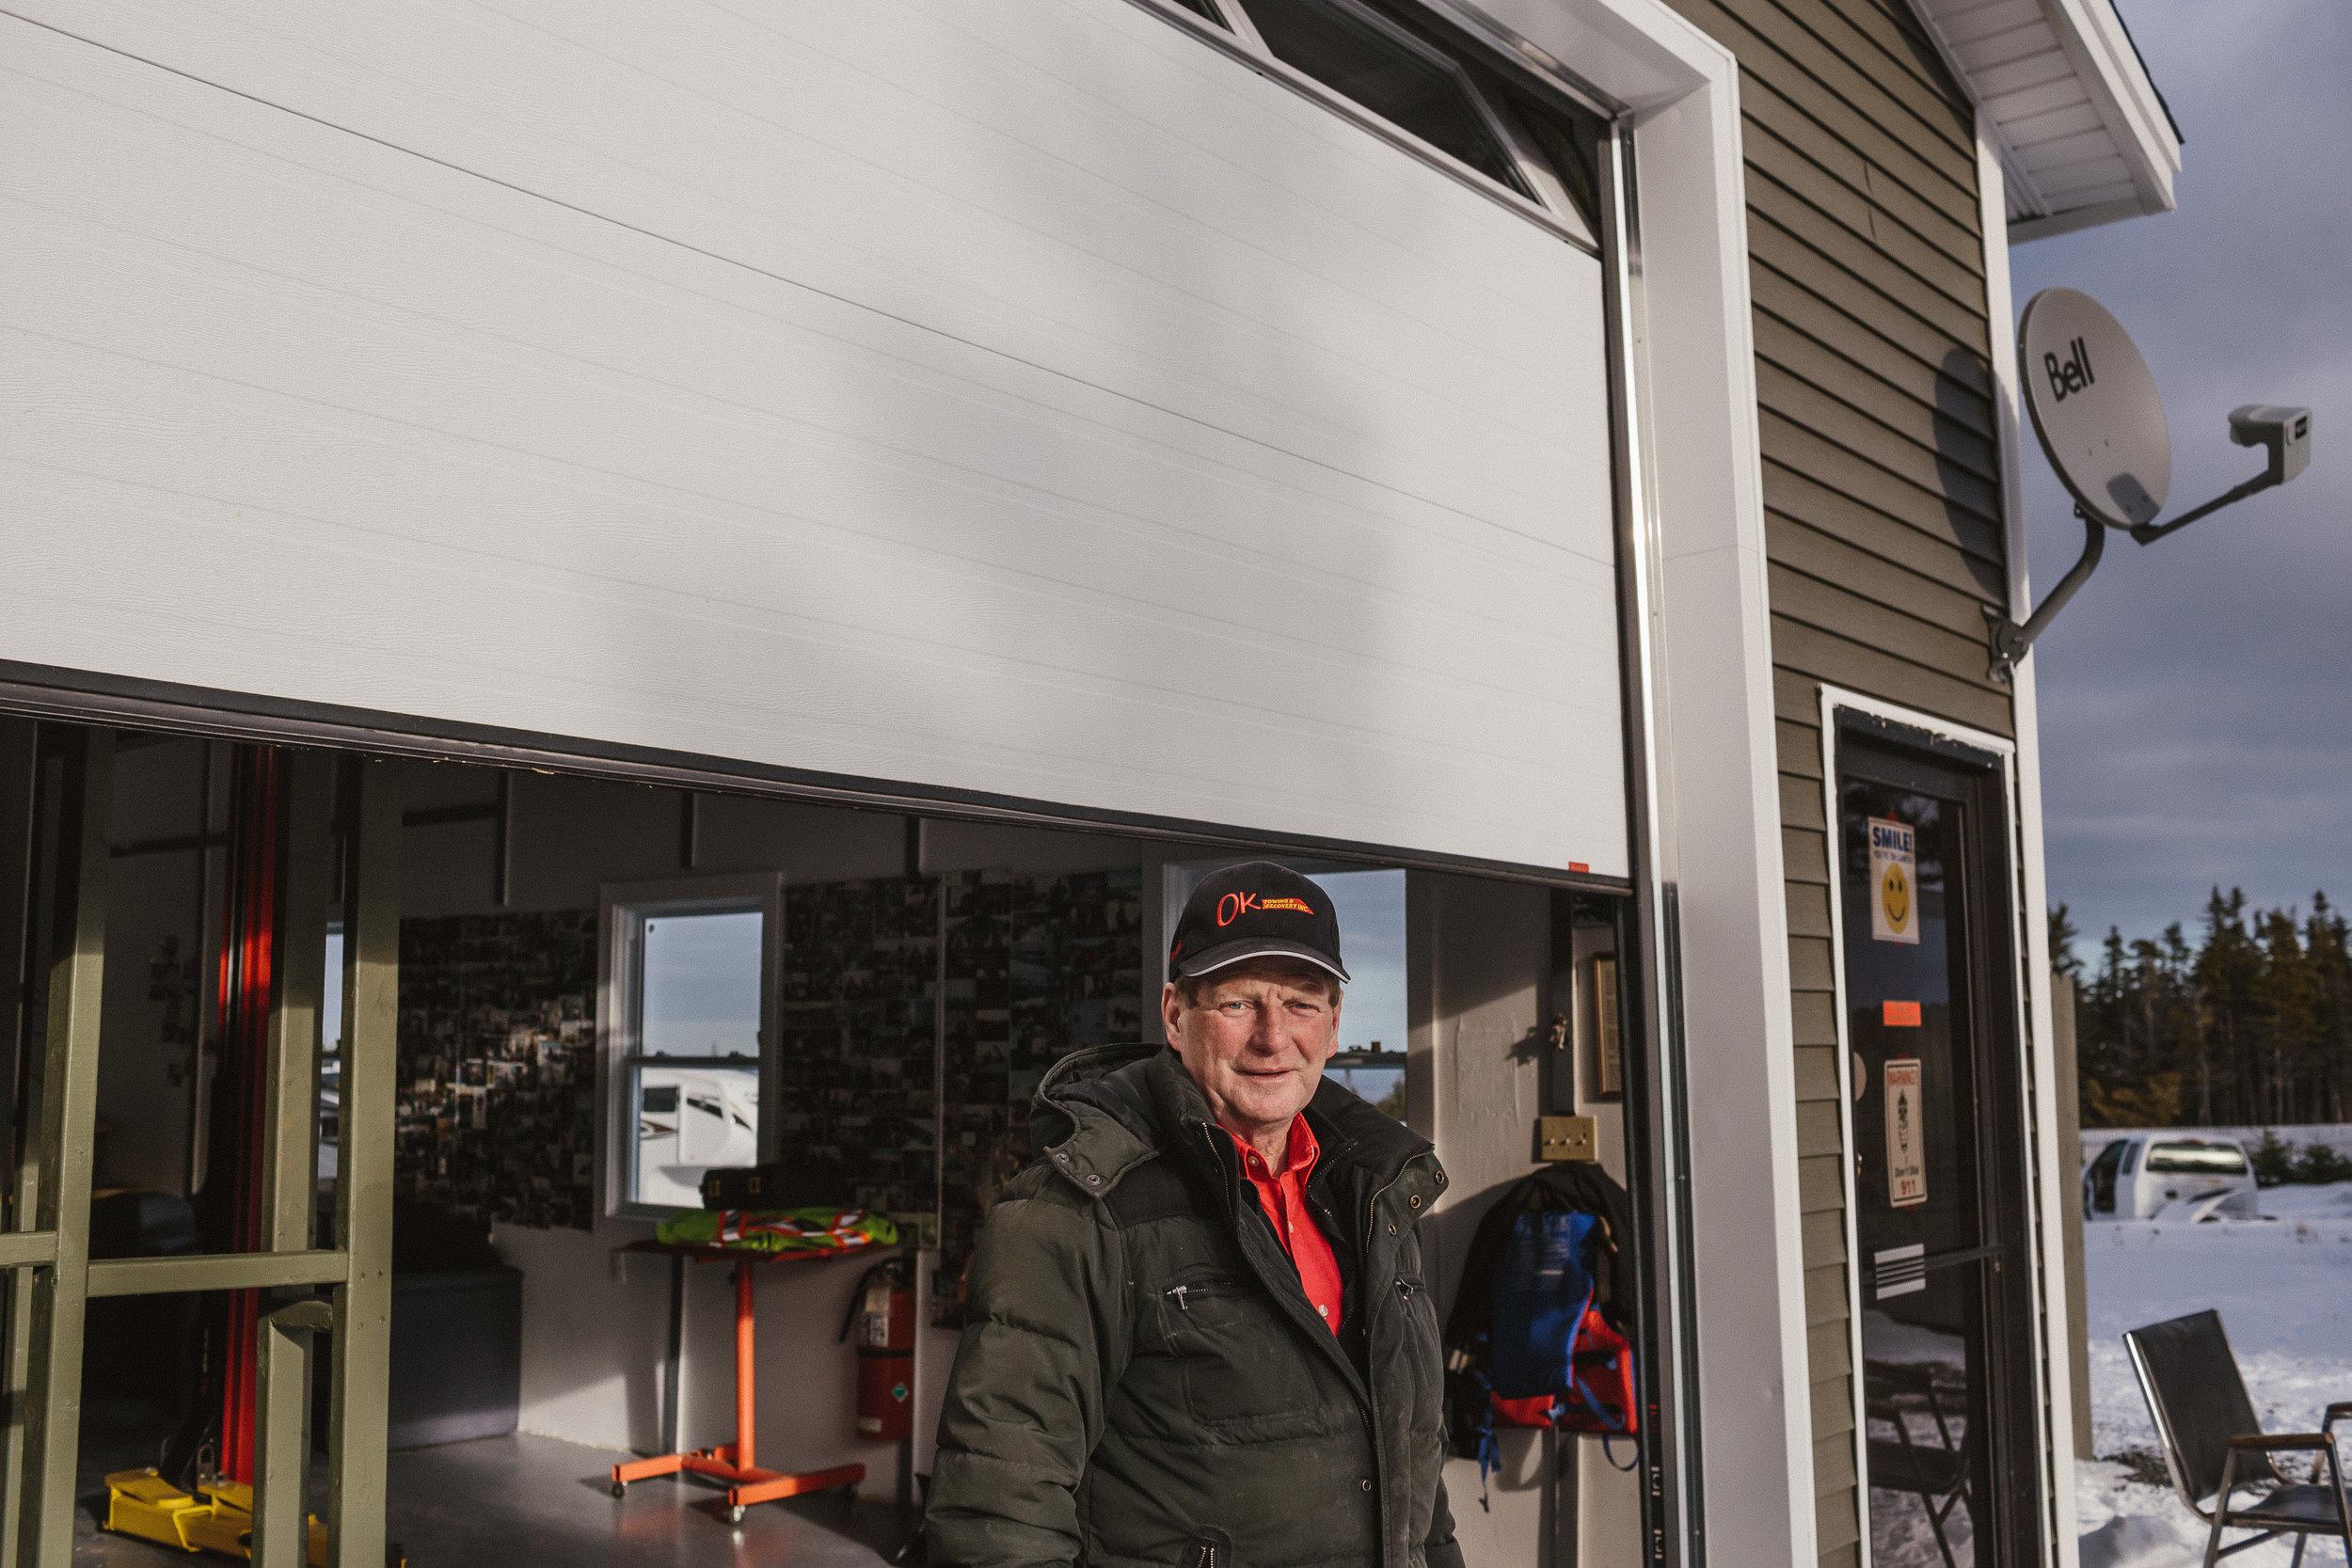 Bob O'keefe . The Man , the rebuilder.